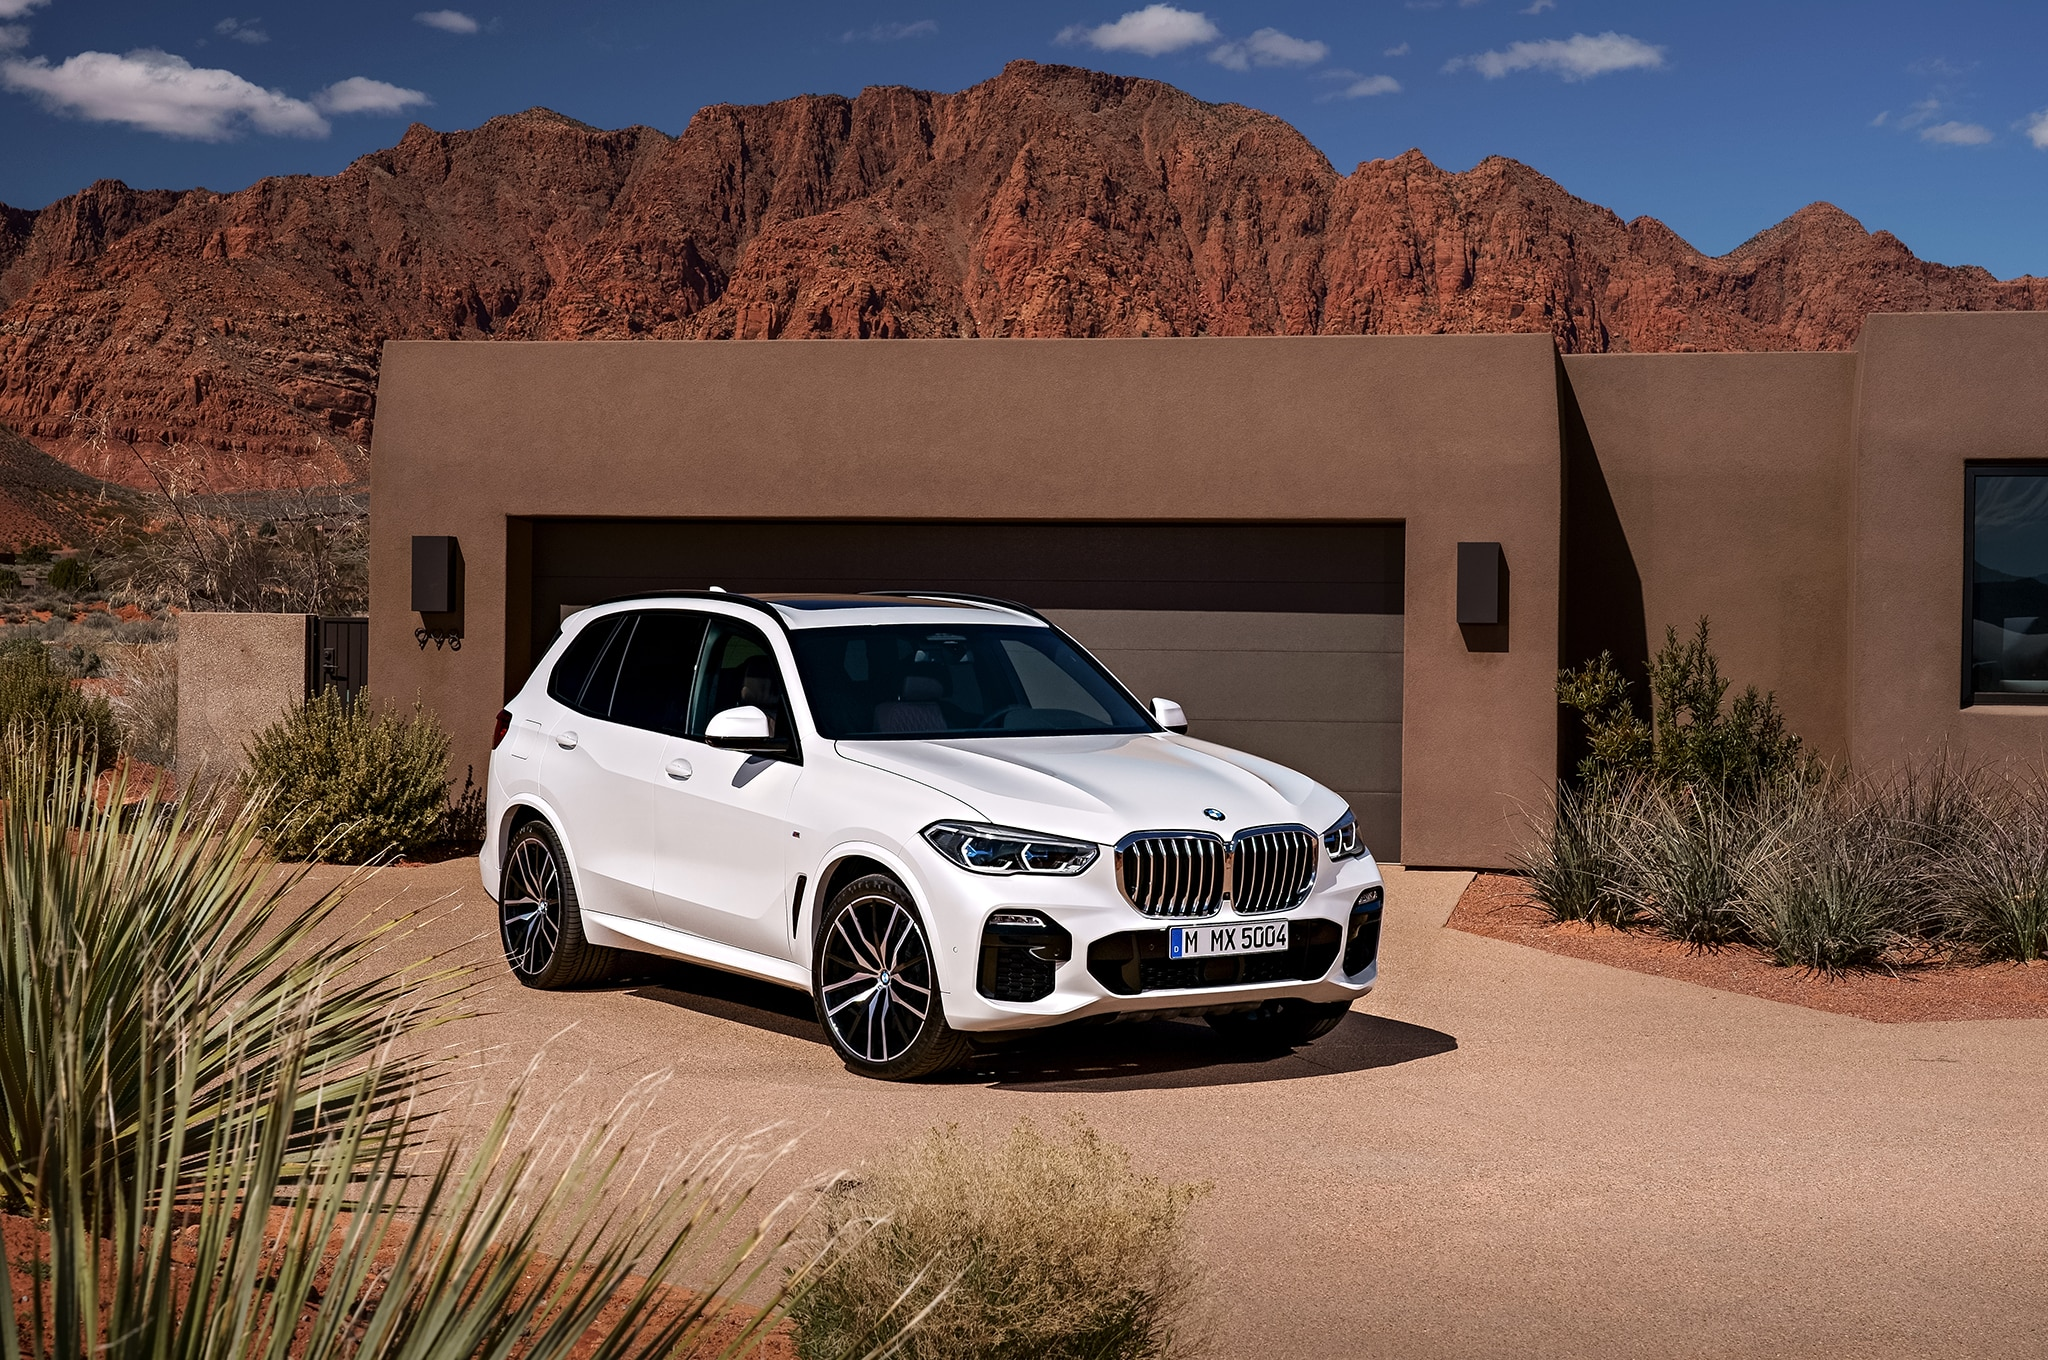 2019 Bmw X5 Priced From 61 695 Automobile Magazine